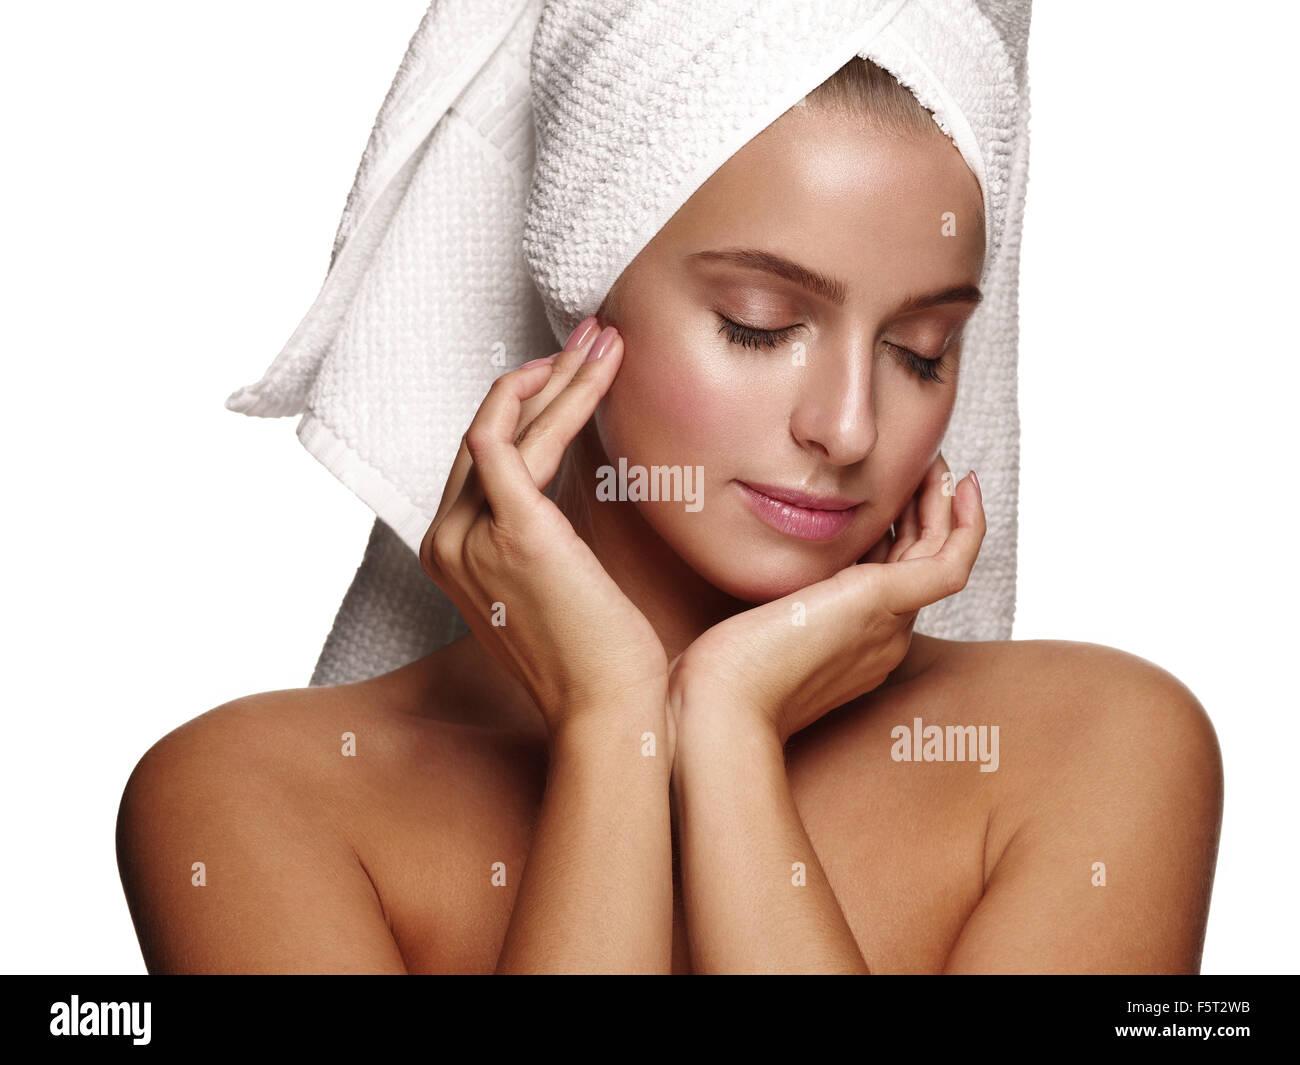 Shower girls